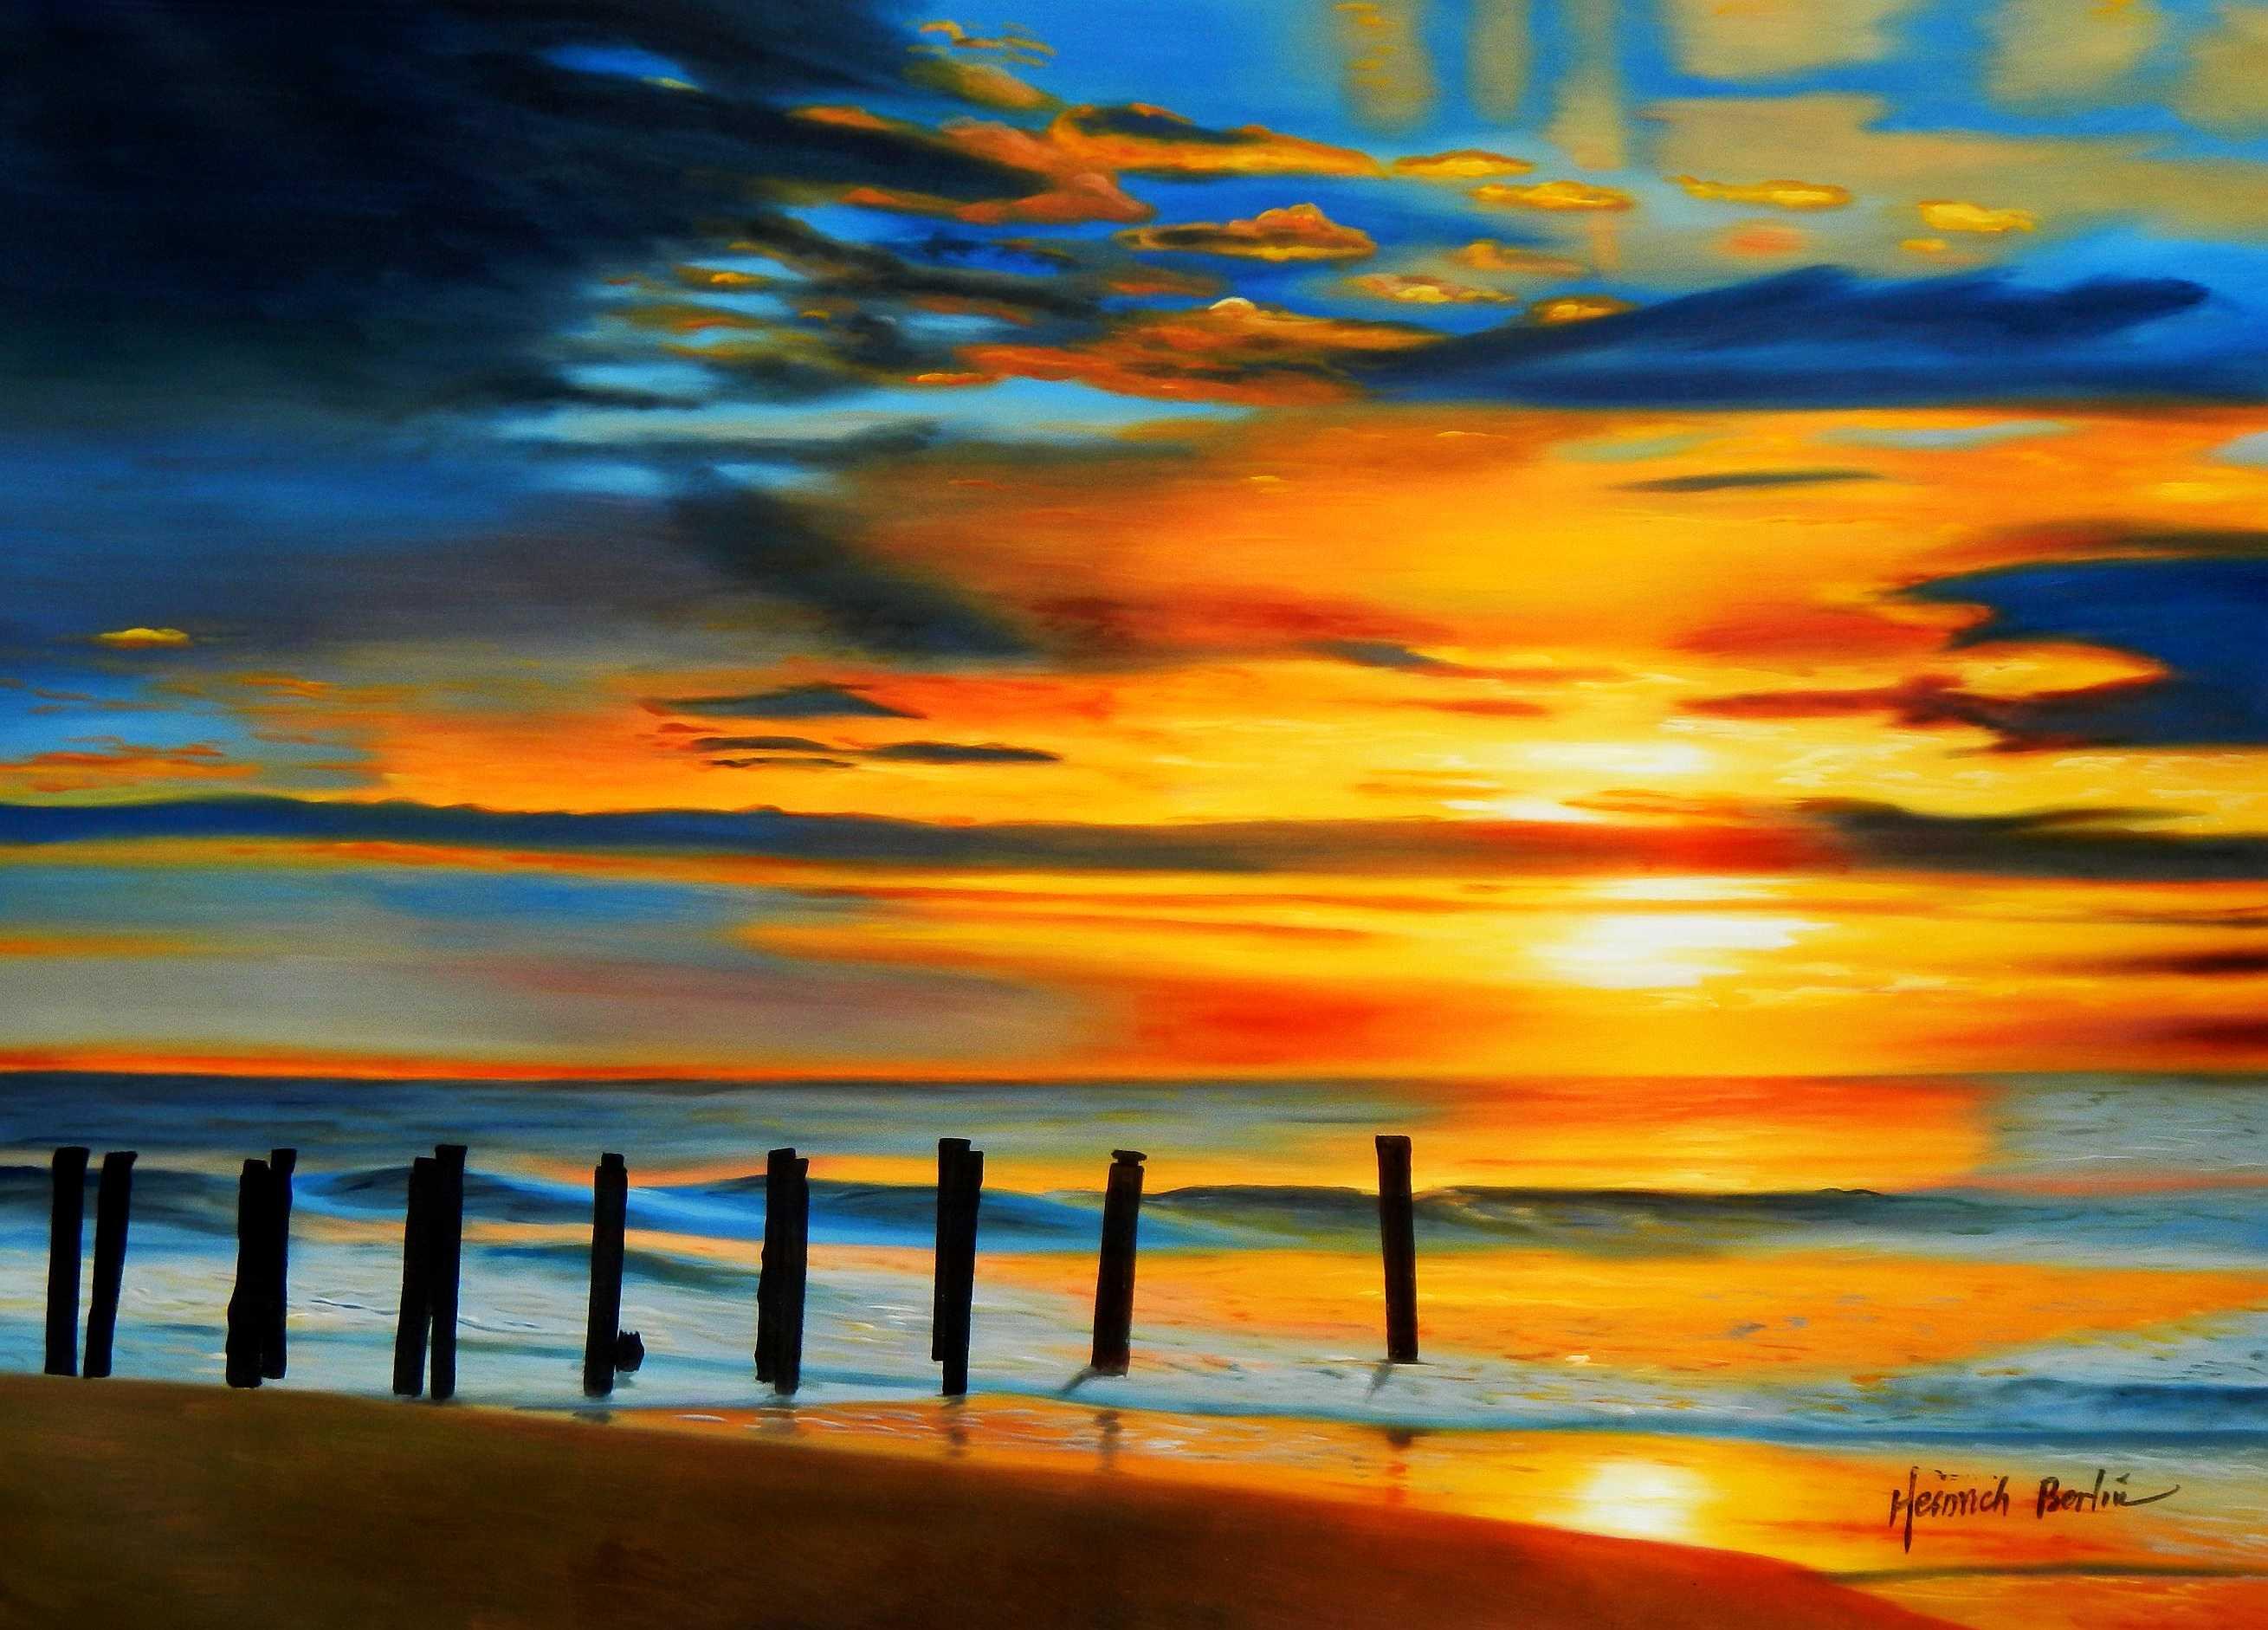 Modern Art - Nordsee Sonnenuntergang i95290 80x110cm handgemaltes Ölbild